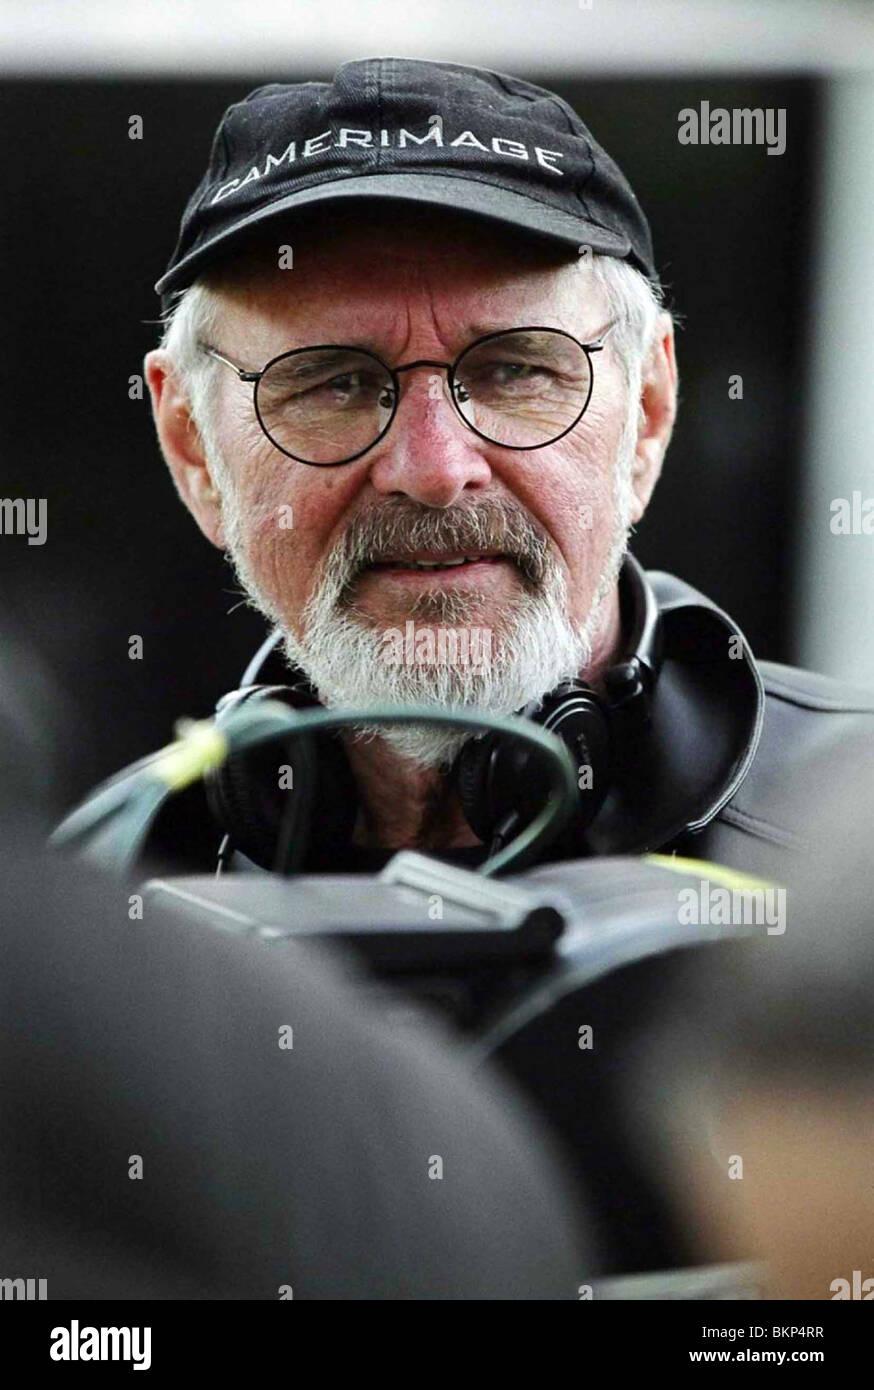 FILMING O/S 'THE STATEMENT' (2003) CRIMES CONTRE L'HUMANITE (ALT) NORMAN JEWISON (DIR) CCIL 004 - Stock Image